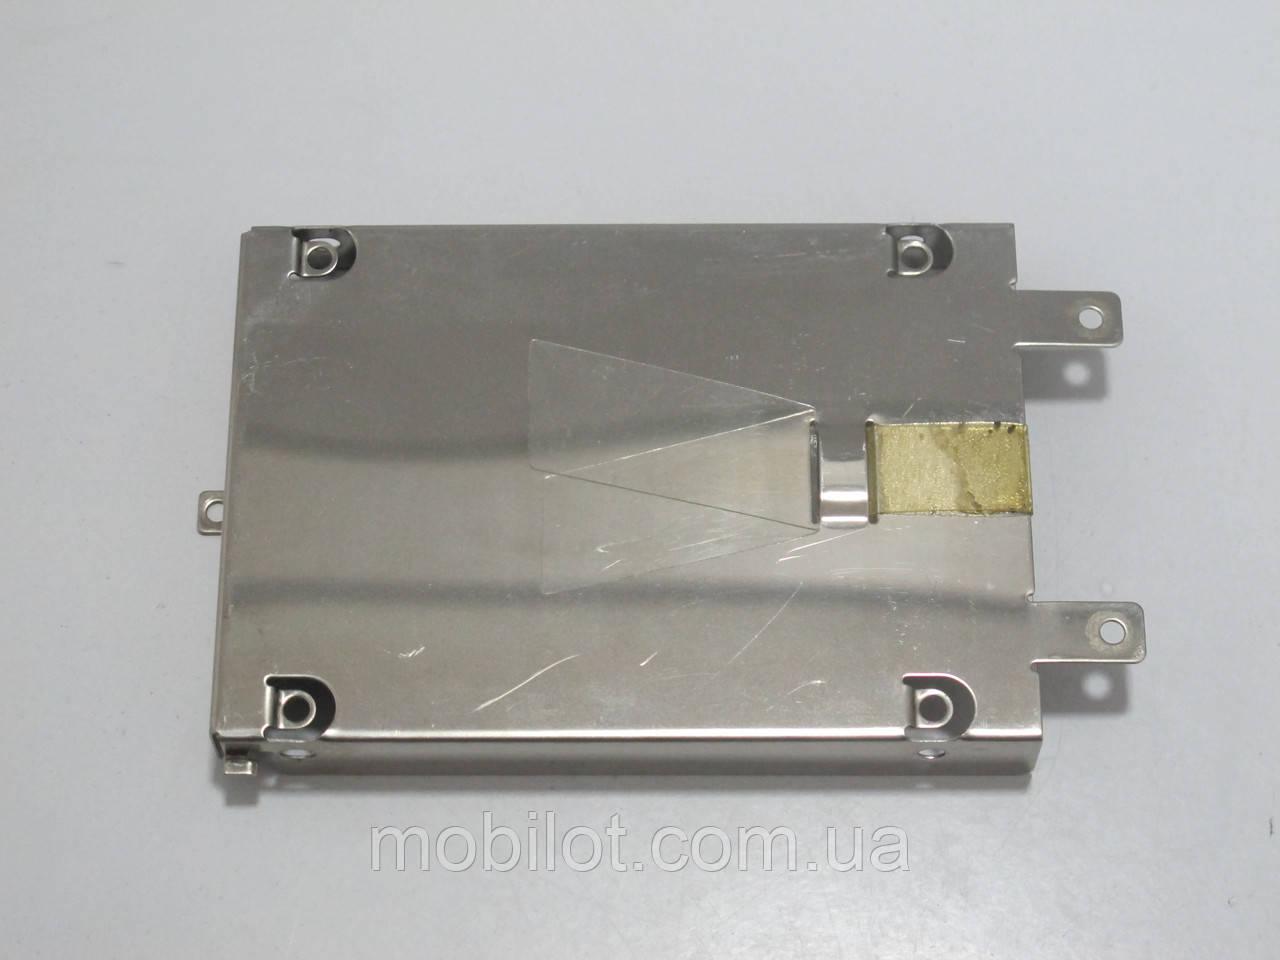 Корпус (карман, корзина, крепление) для HDD Acer A3000 (NZ-5568)